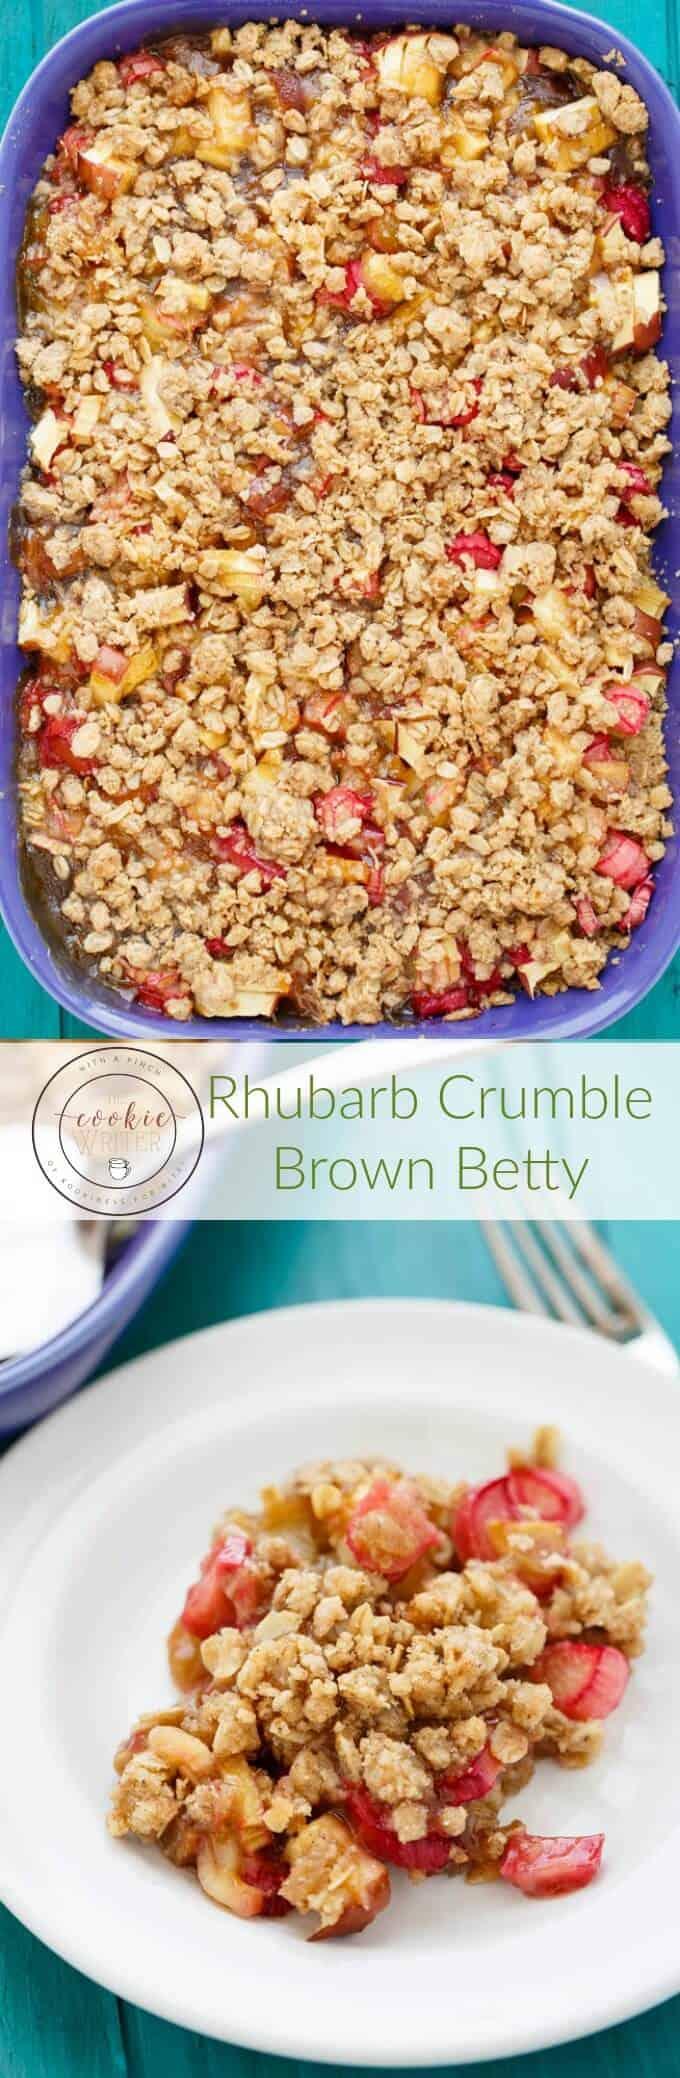 Rhubarb Crumble Brown Betty